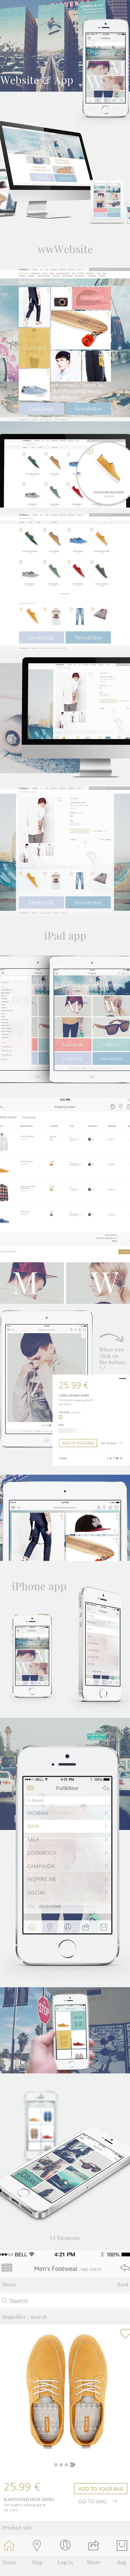 Pull&Bear //  Web & App by Iwona Kulińska, via Behance